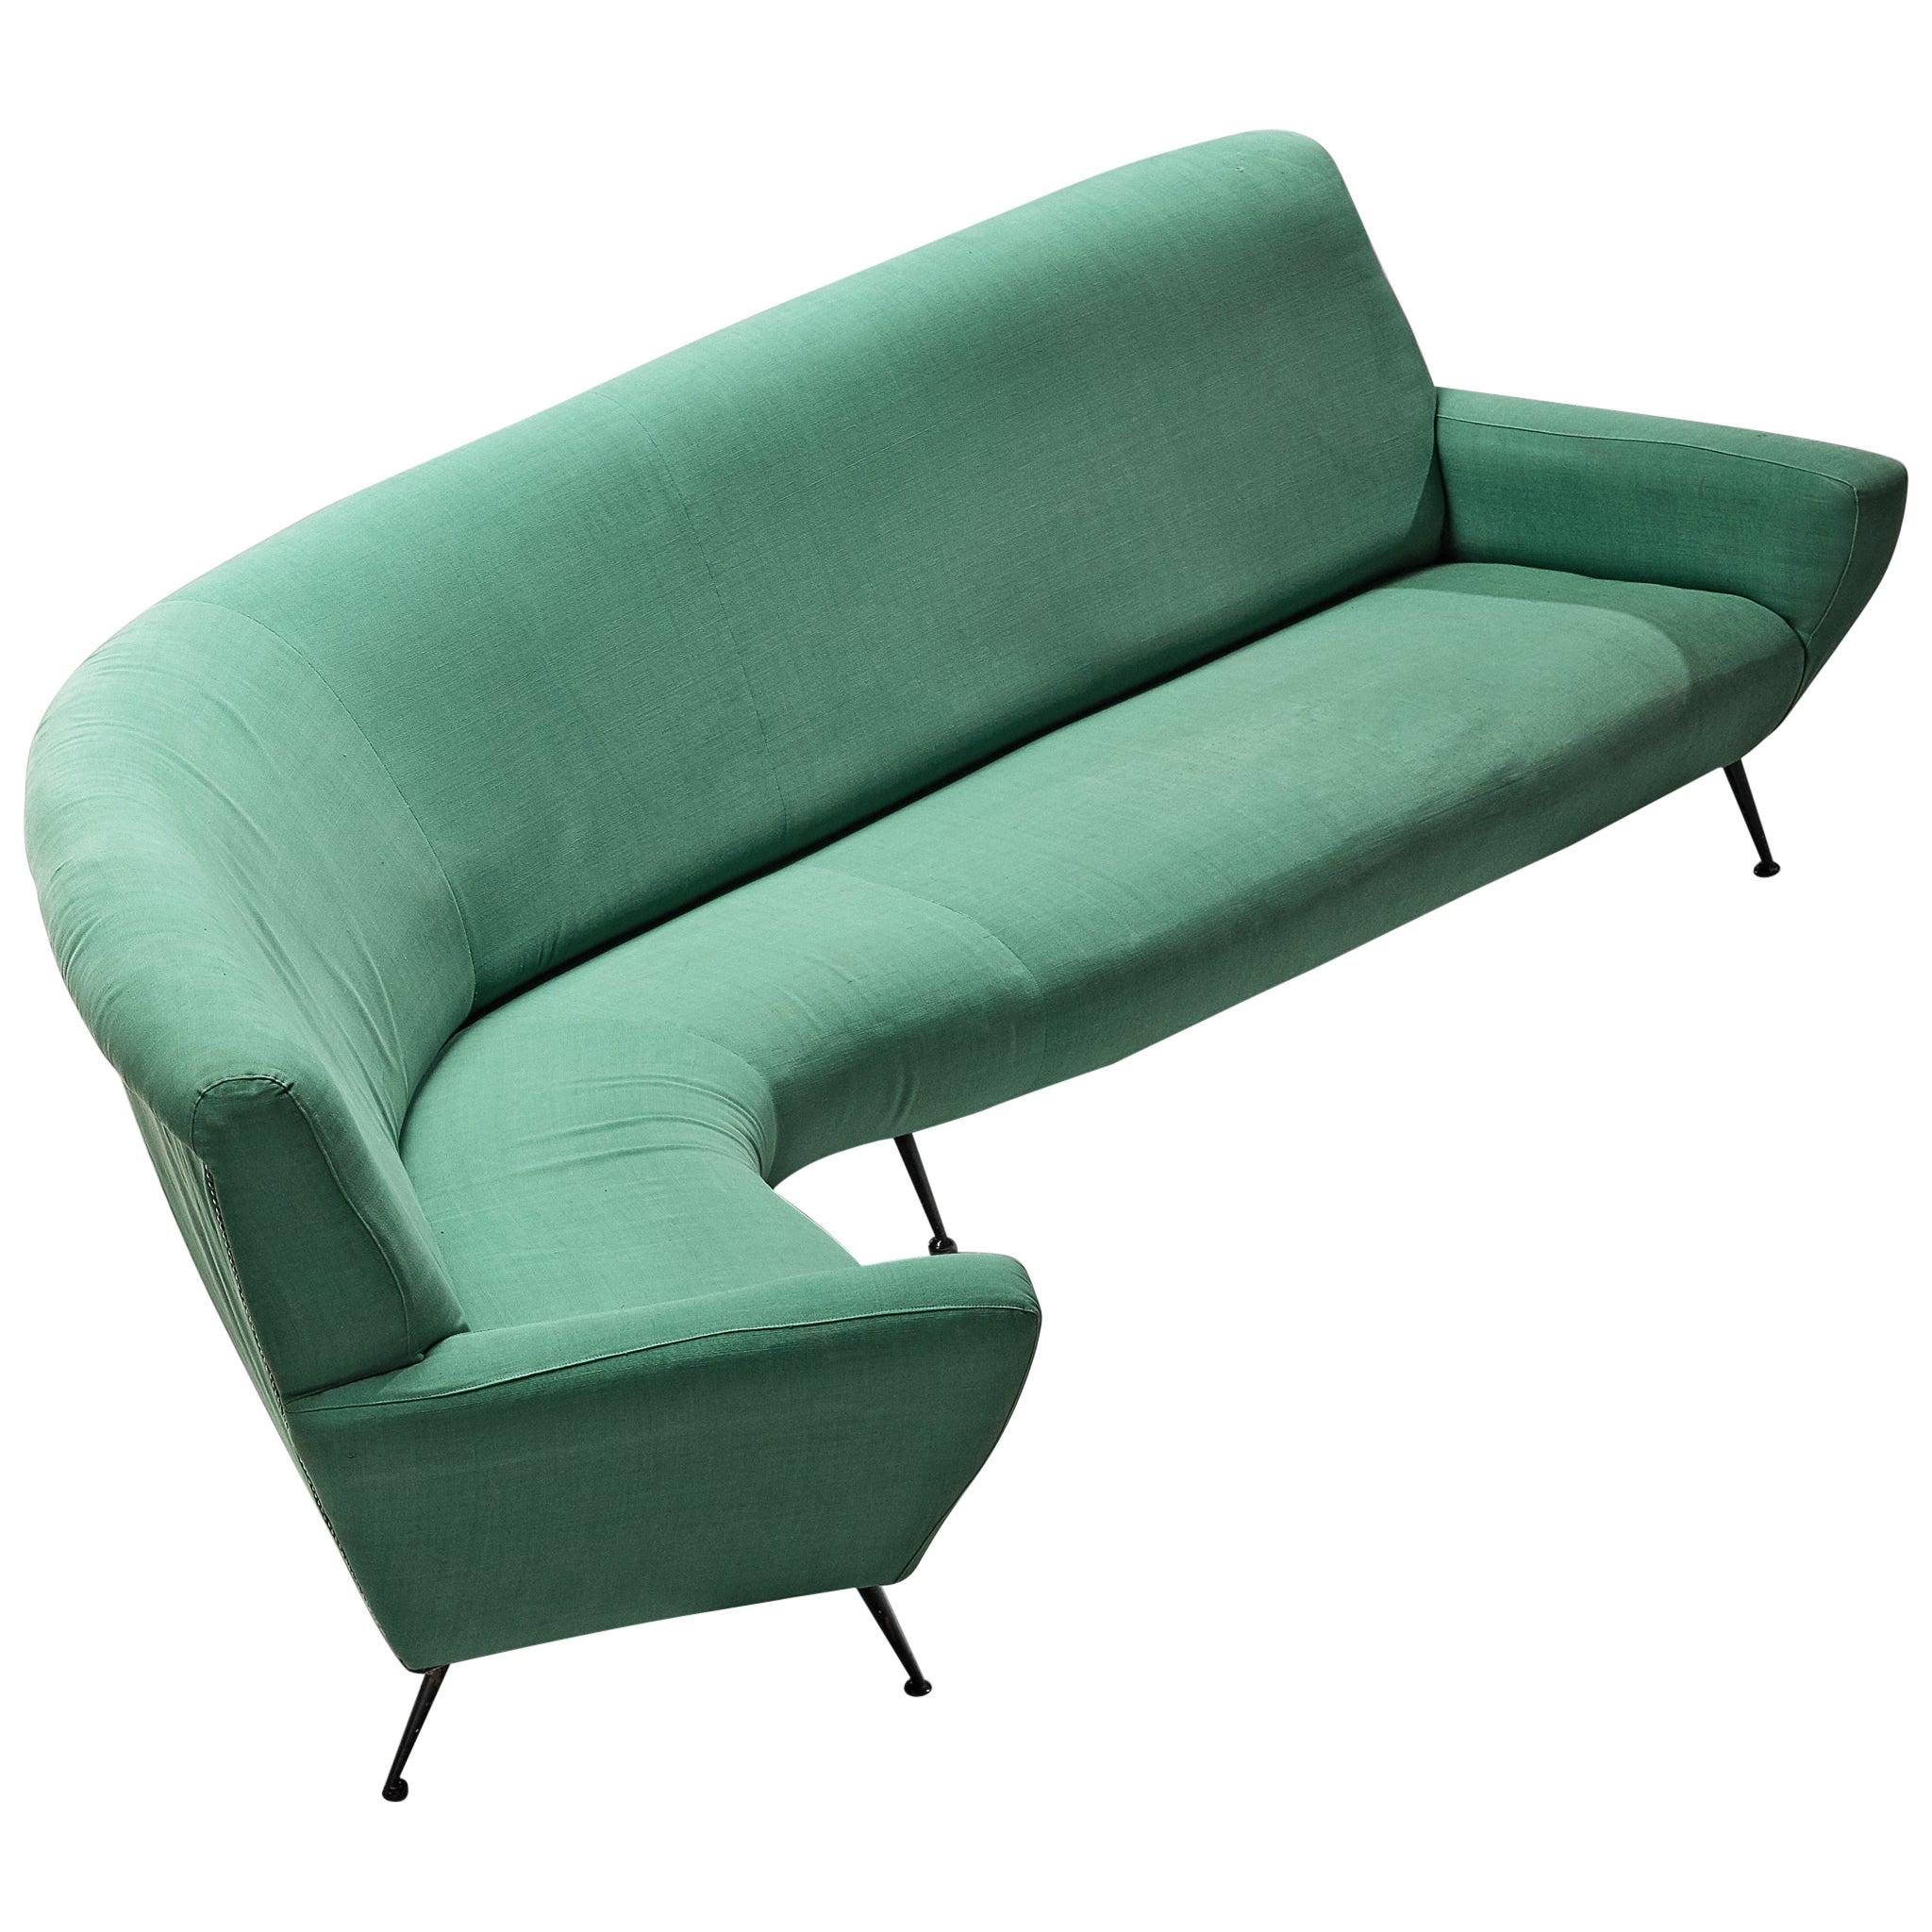 Gigi Radice Curved Sofa for Minotti